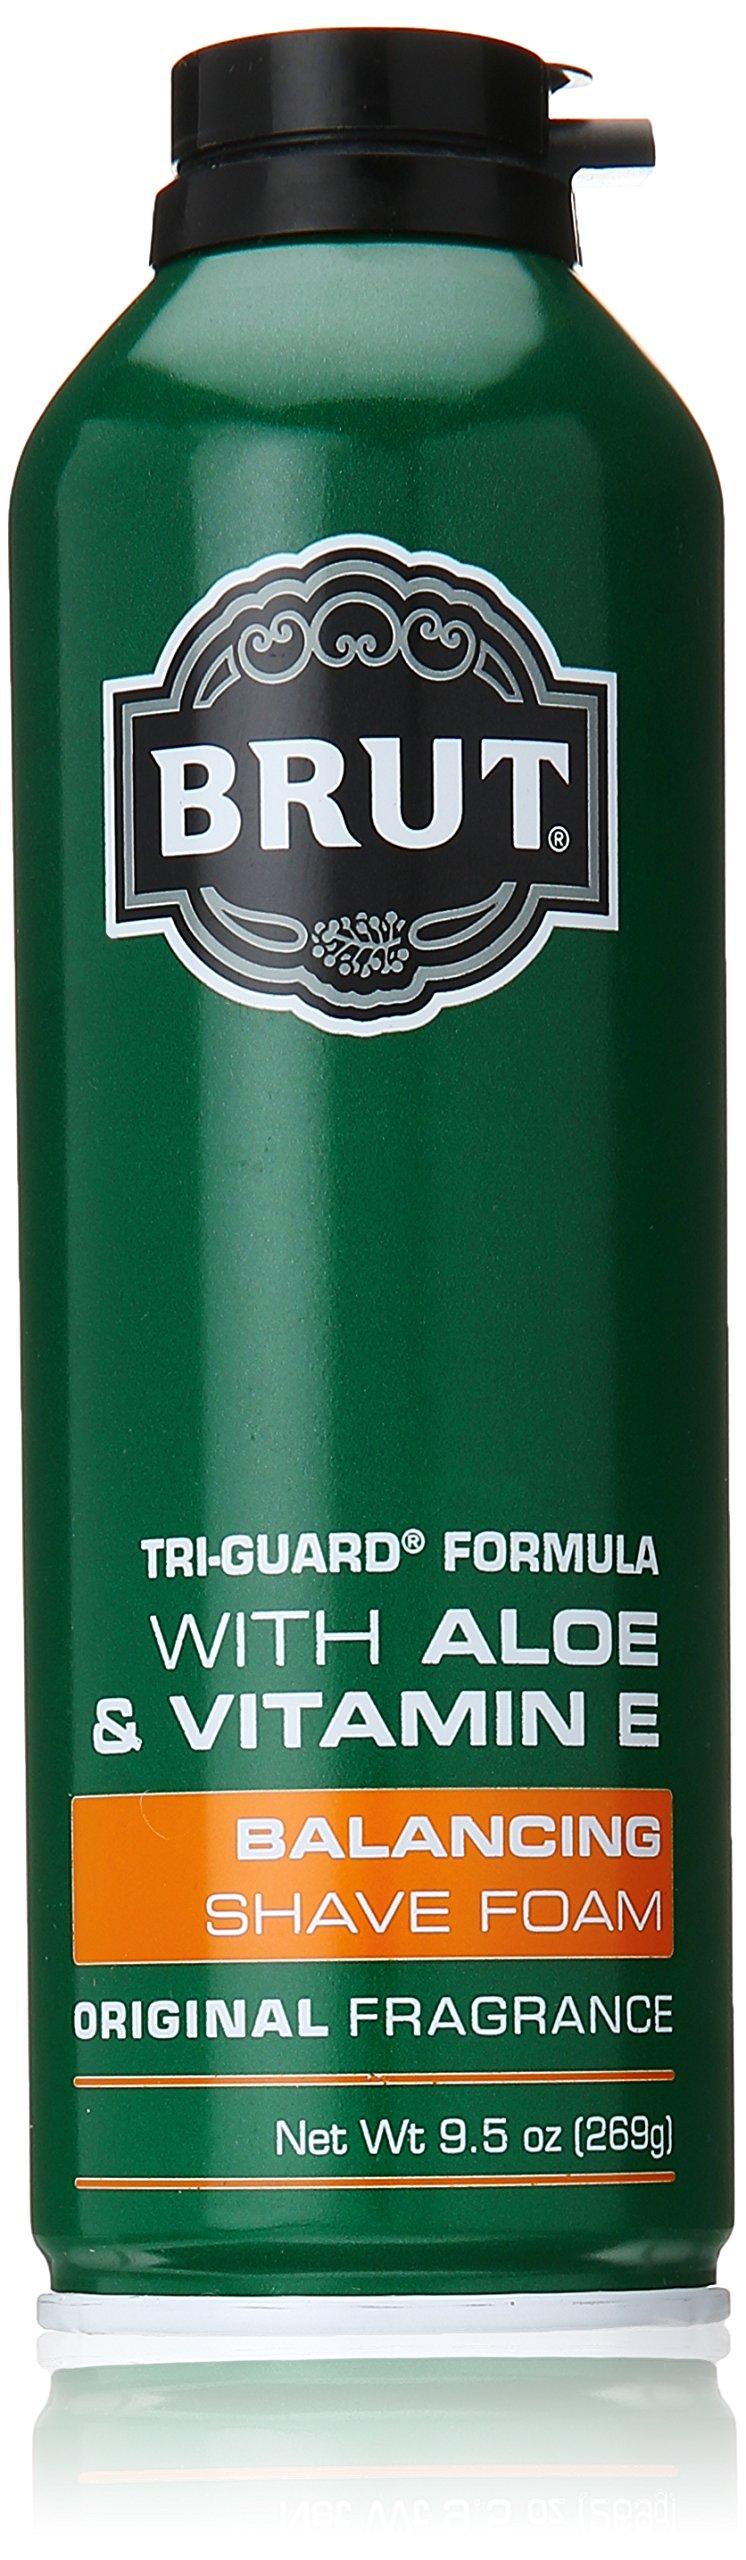 Brut Tri Guard Formula Balancing Shaving Lotion with Aloe and Vitamin E, Original Fragrance, 9.5 Ounce